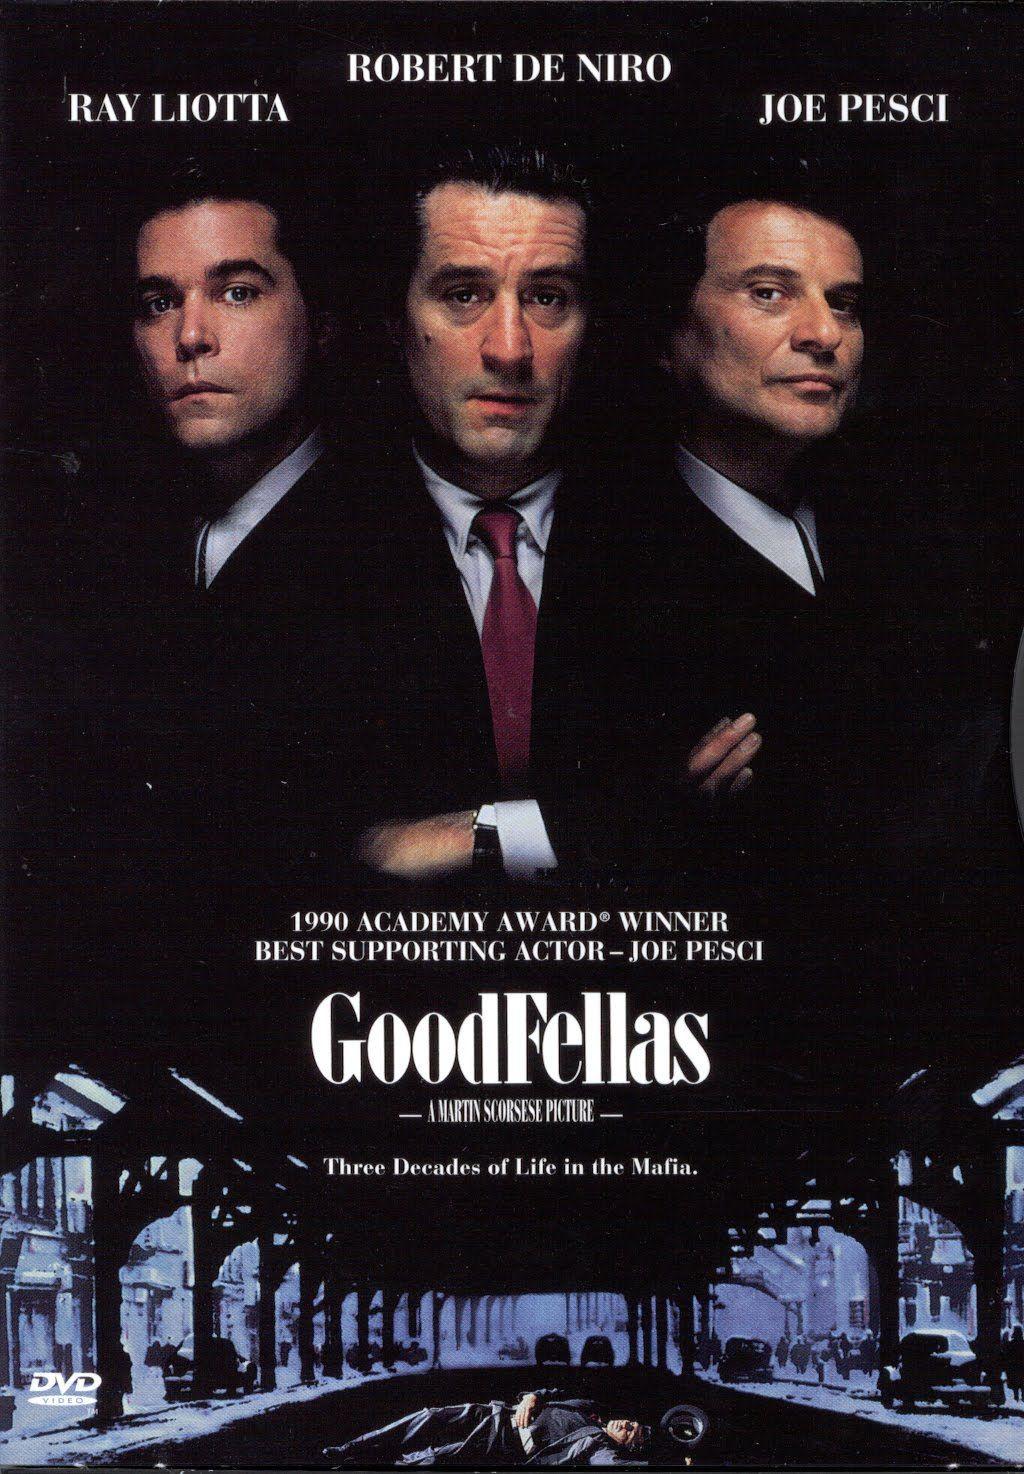 Goodfellas Goodfellas Movie Goodfellas Film Goodfellas